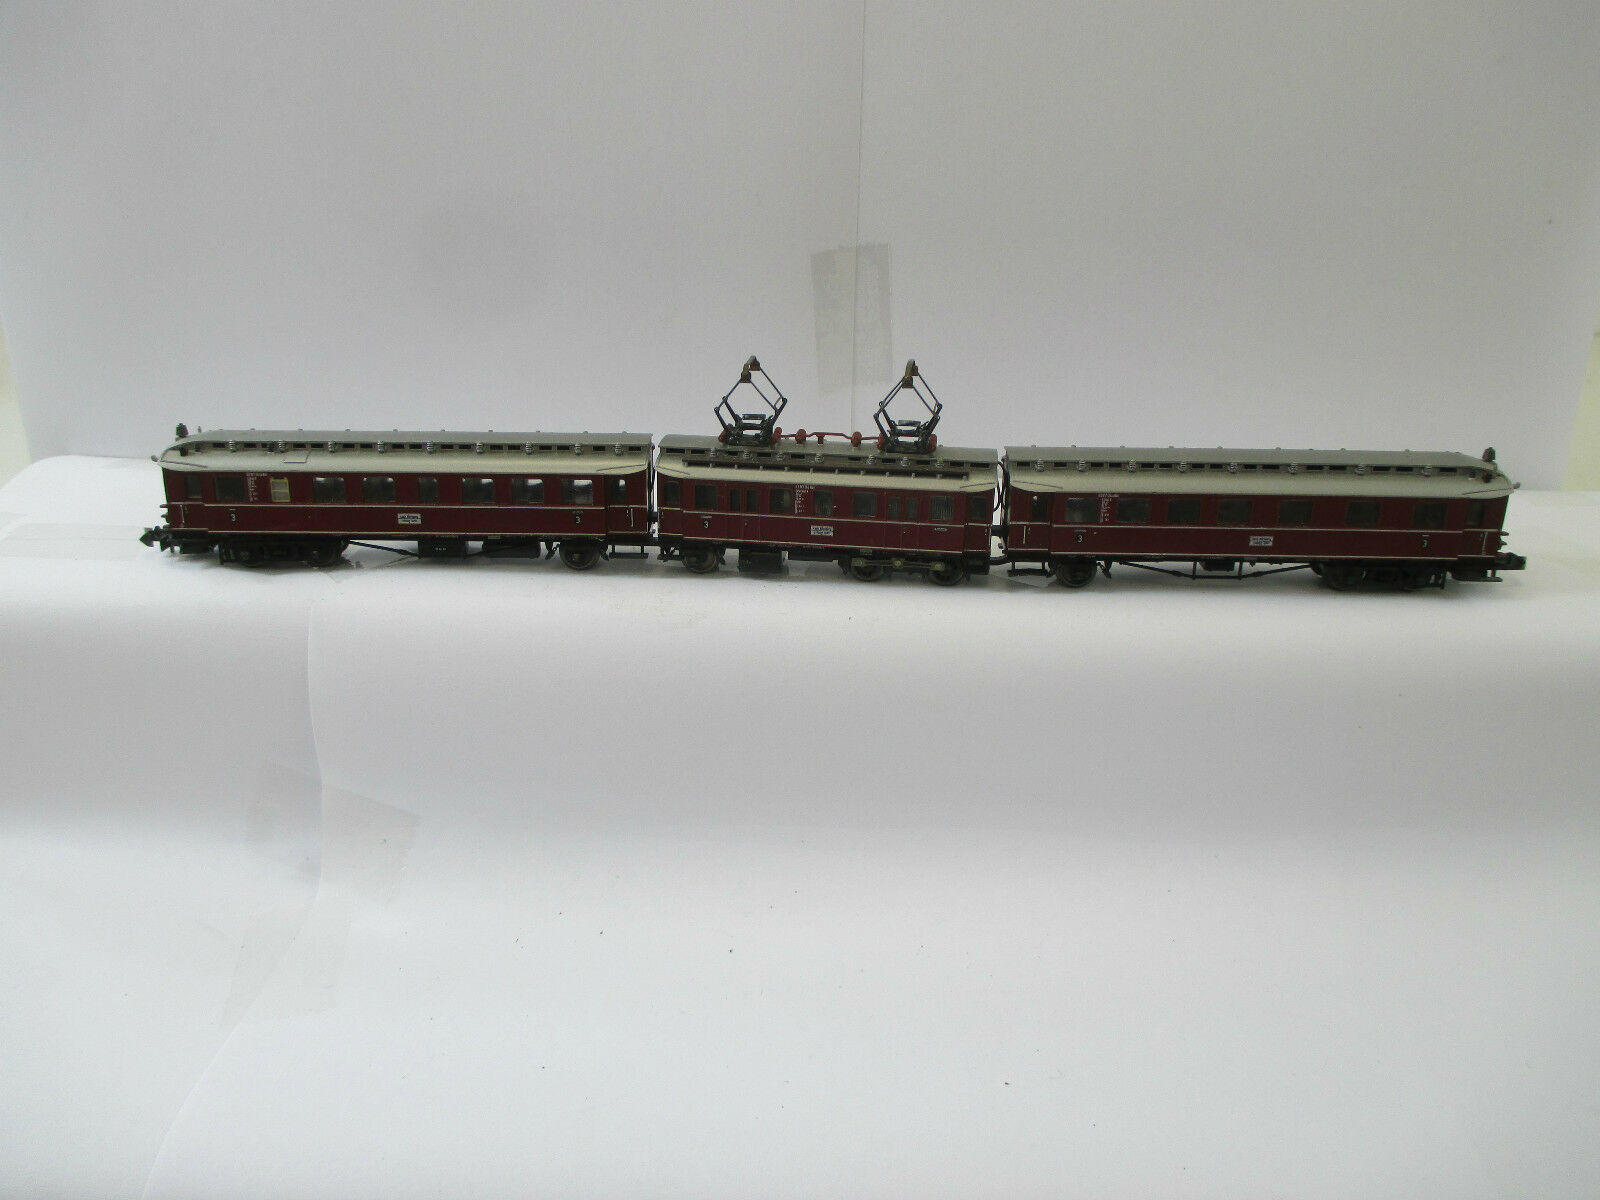 Trix pista n Elektro-triebzug et 87 de la DB 3 piezas s1394